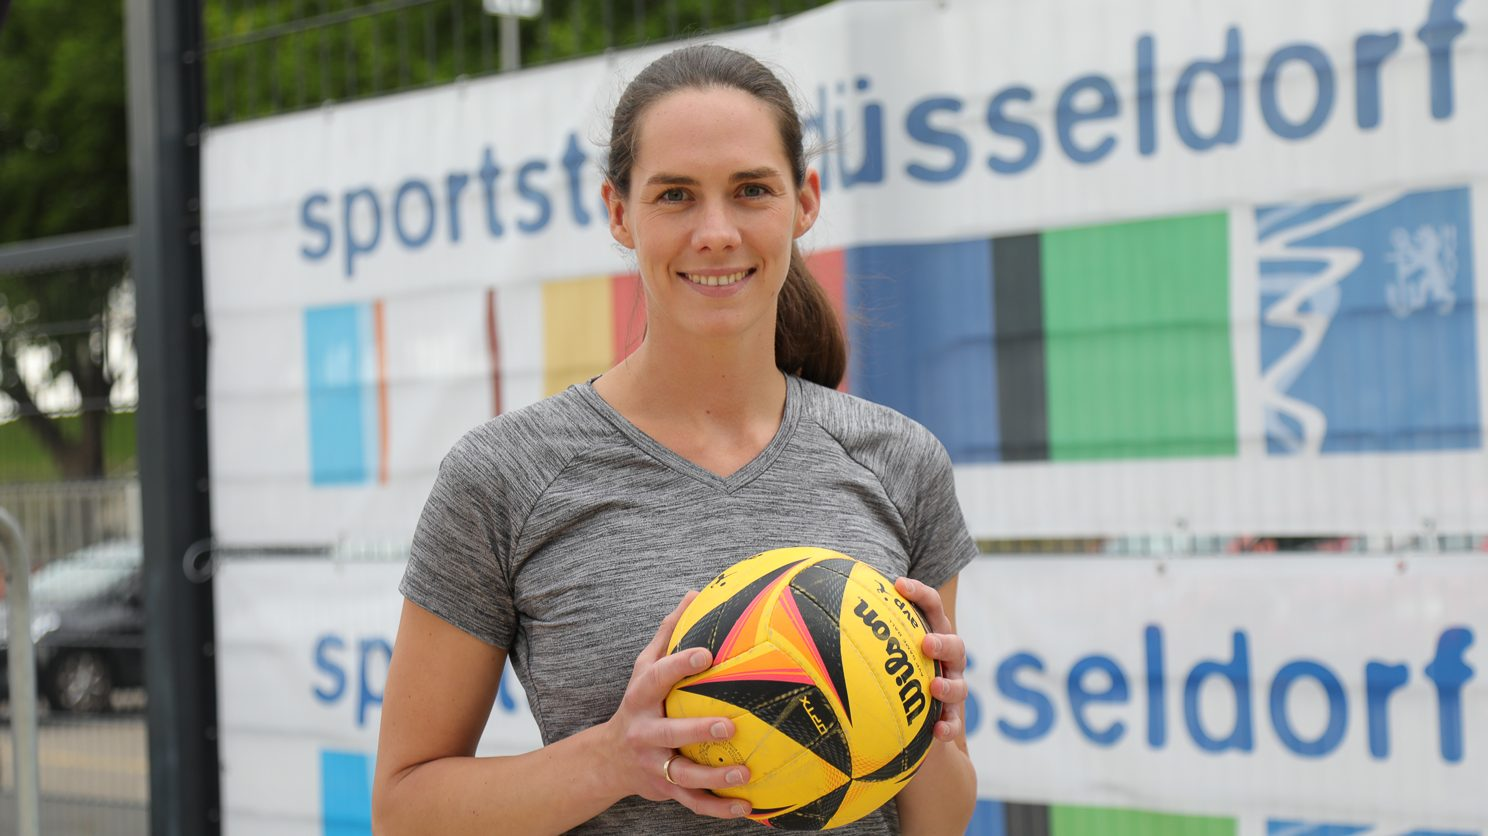 Olympiasiegerin Kira Walkenhorst kehrt nach 23 Monaten in den Sand zurück